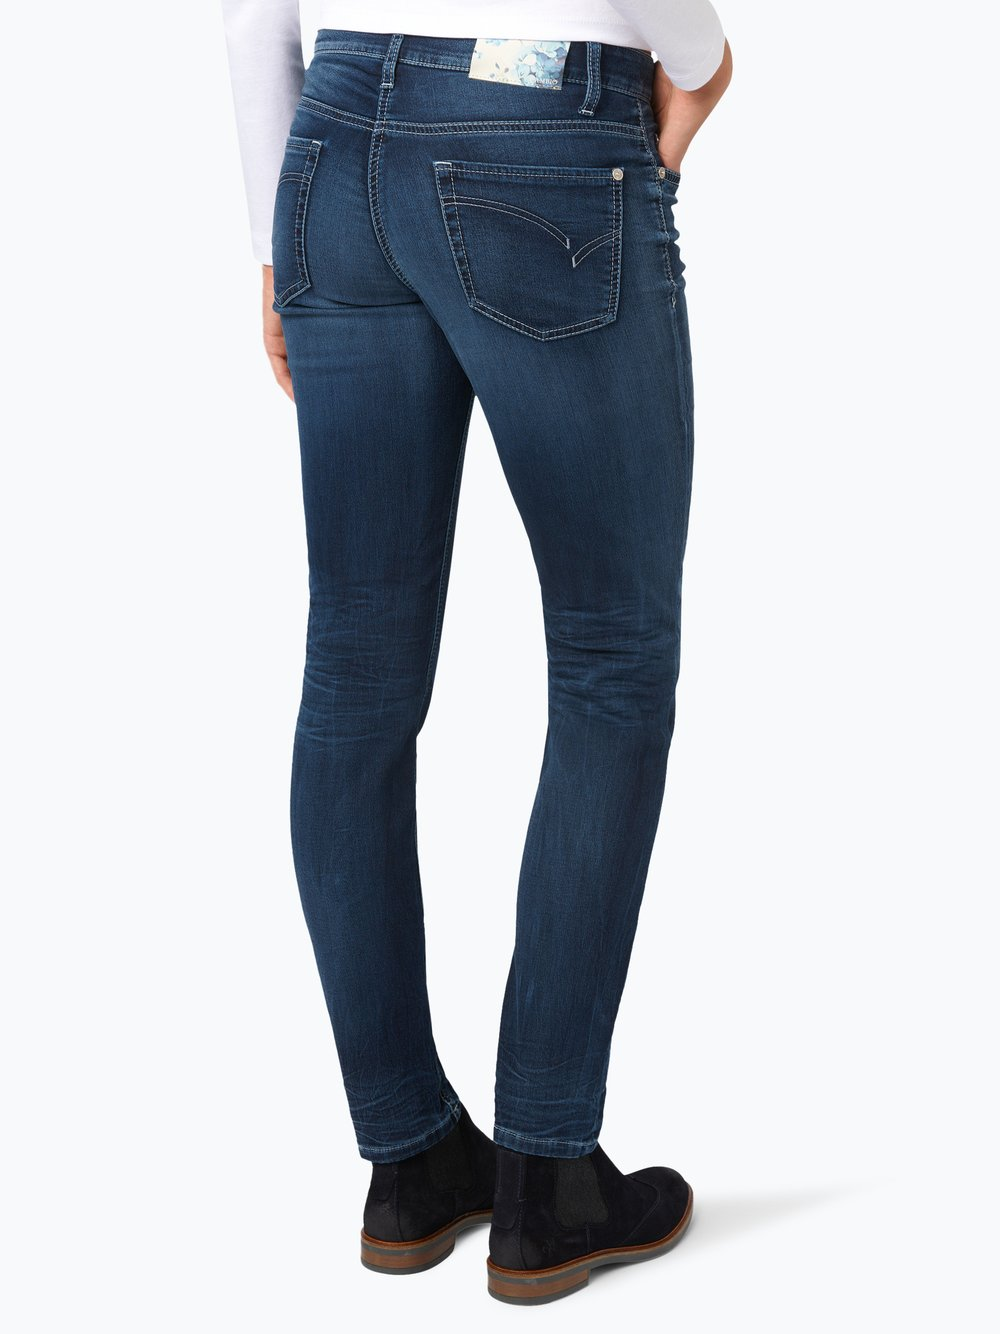 Cambio Liu Jeans mit Ankle cut